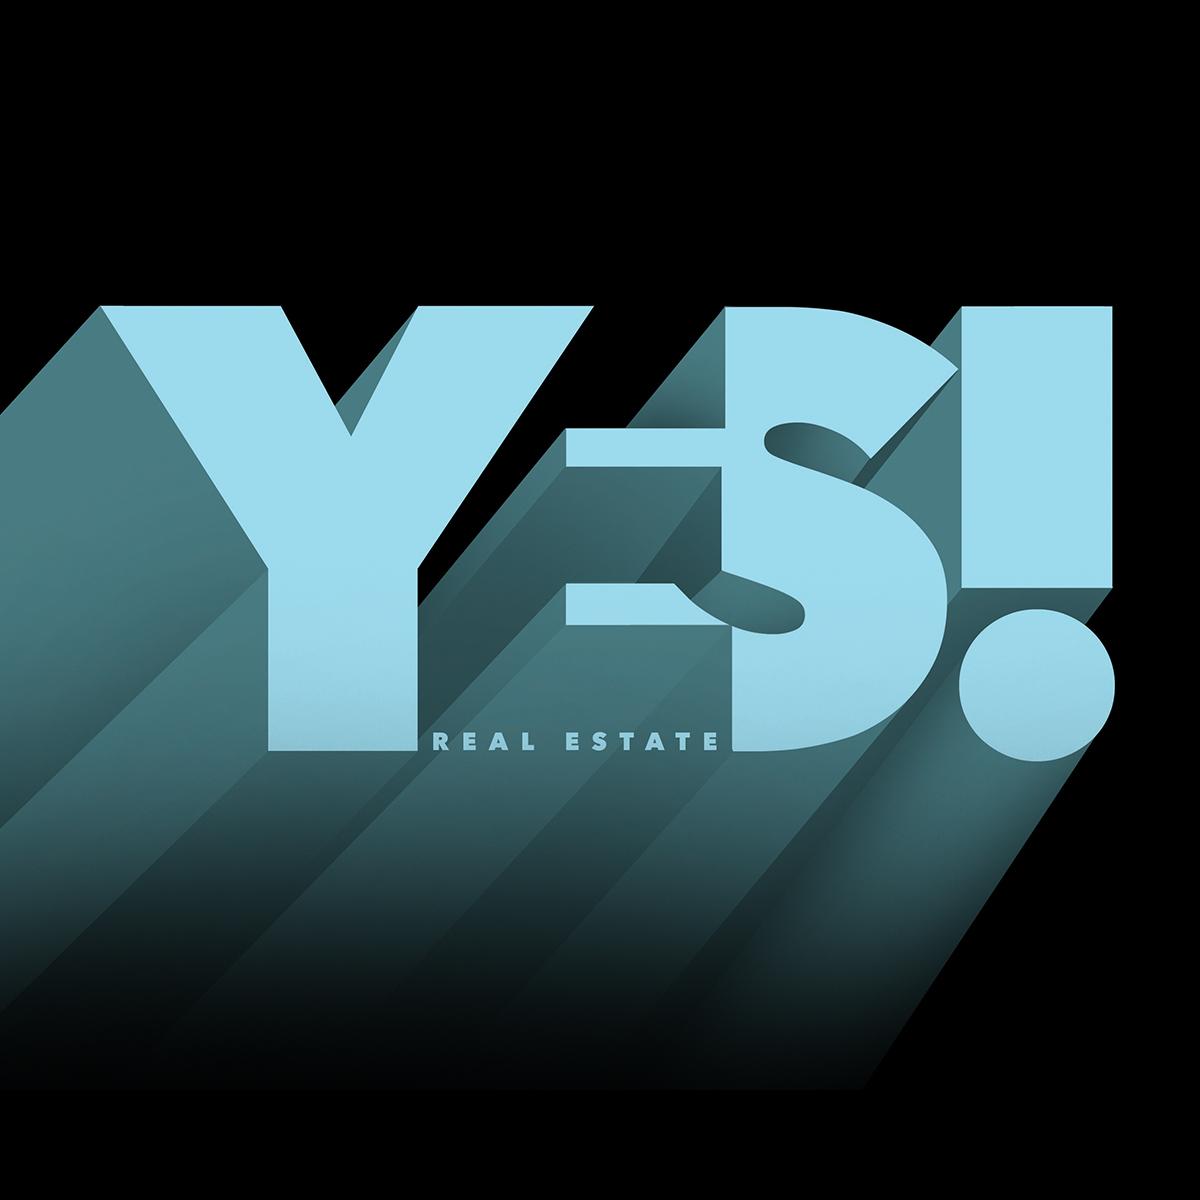 YES_logo-SQ.jpg